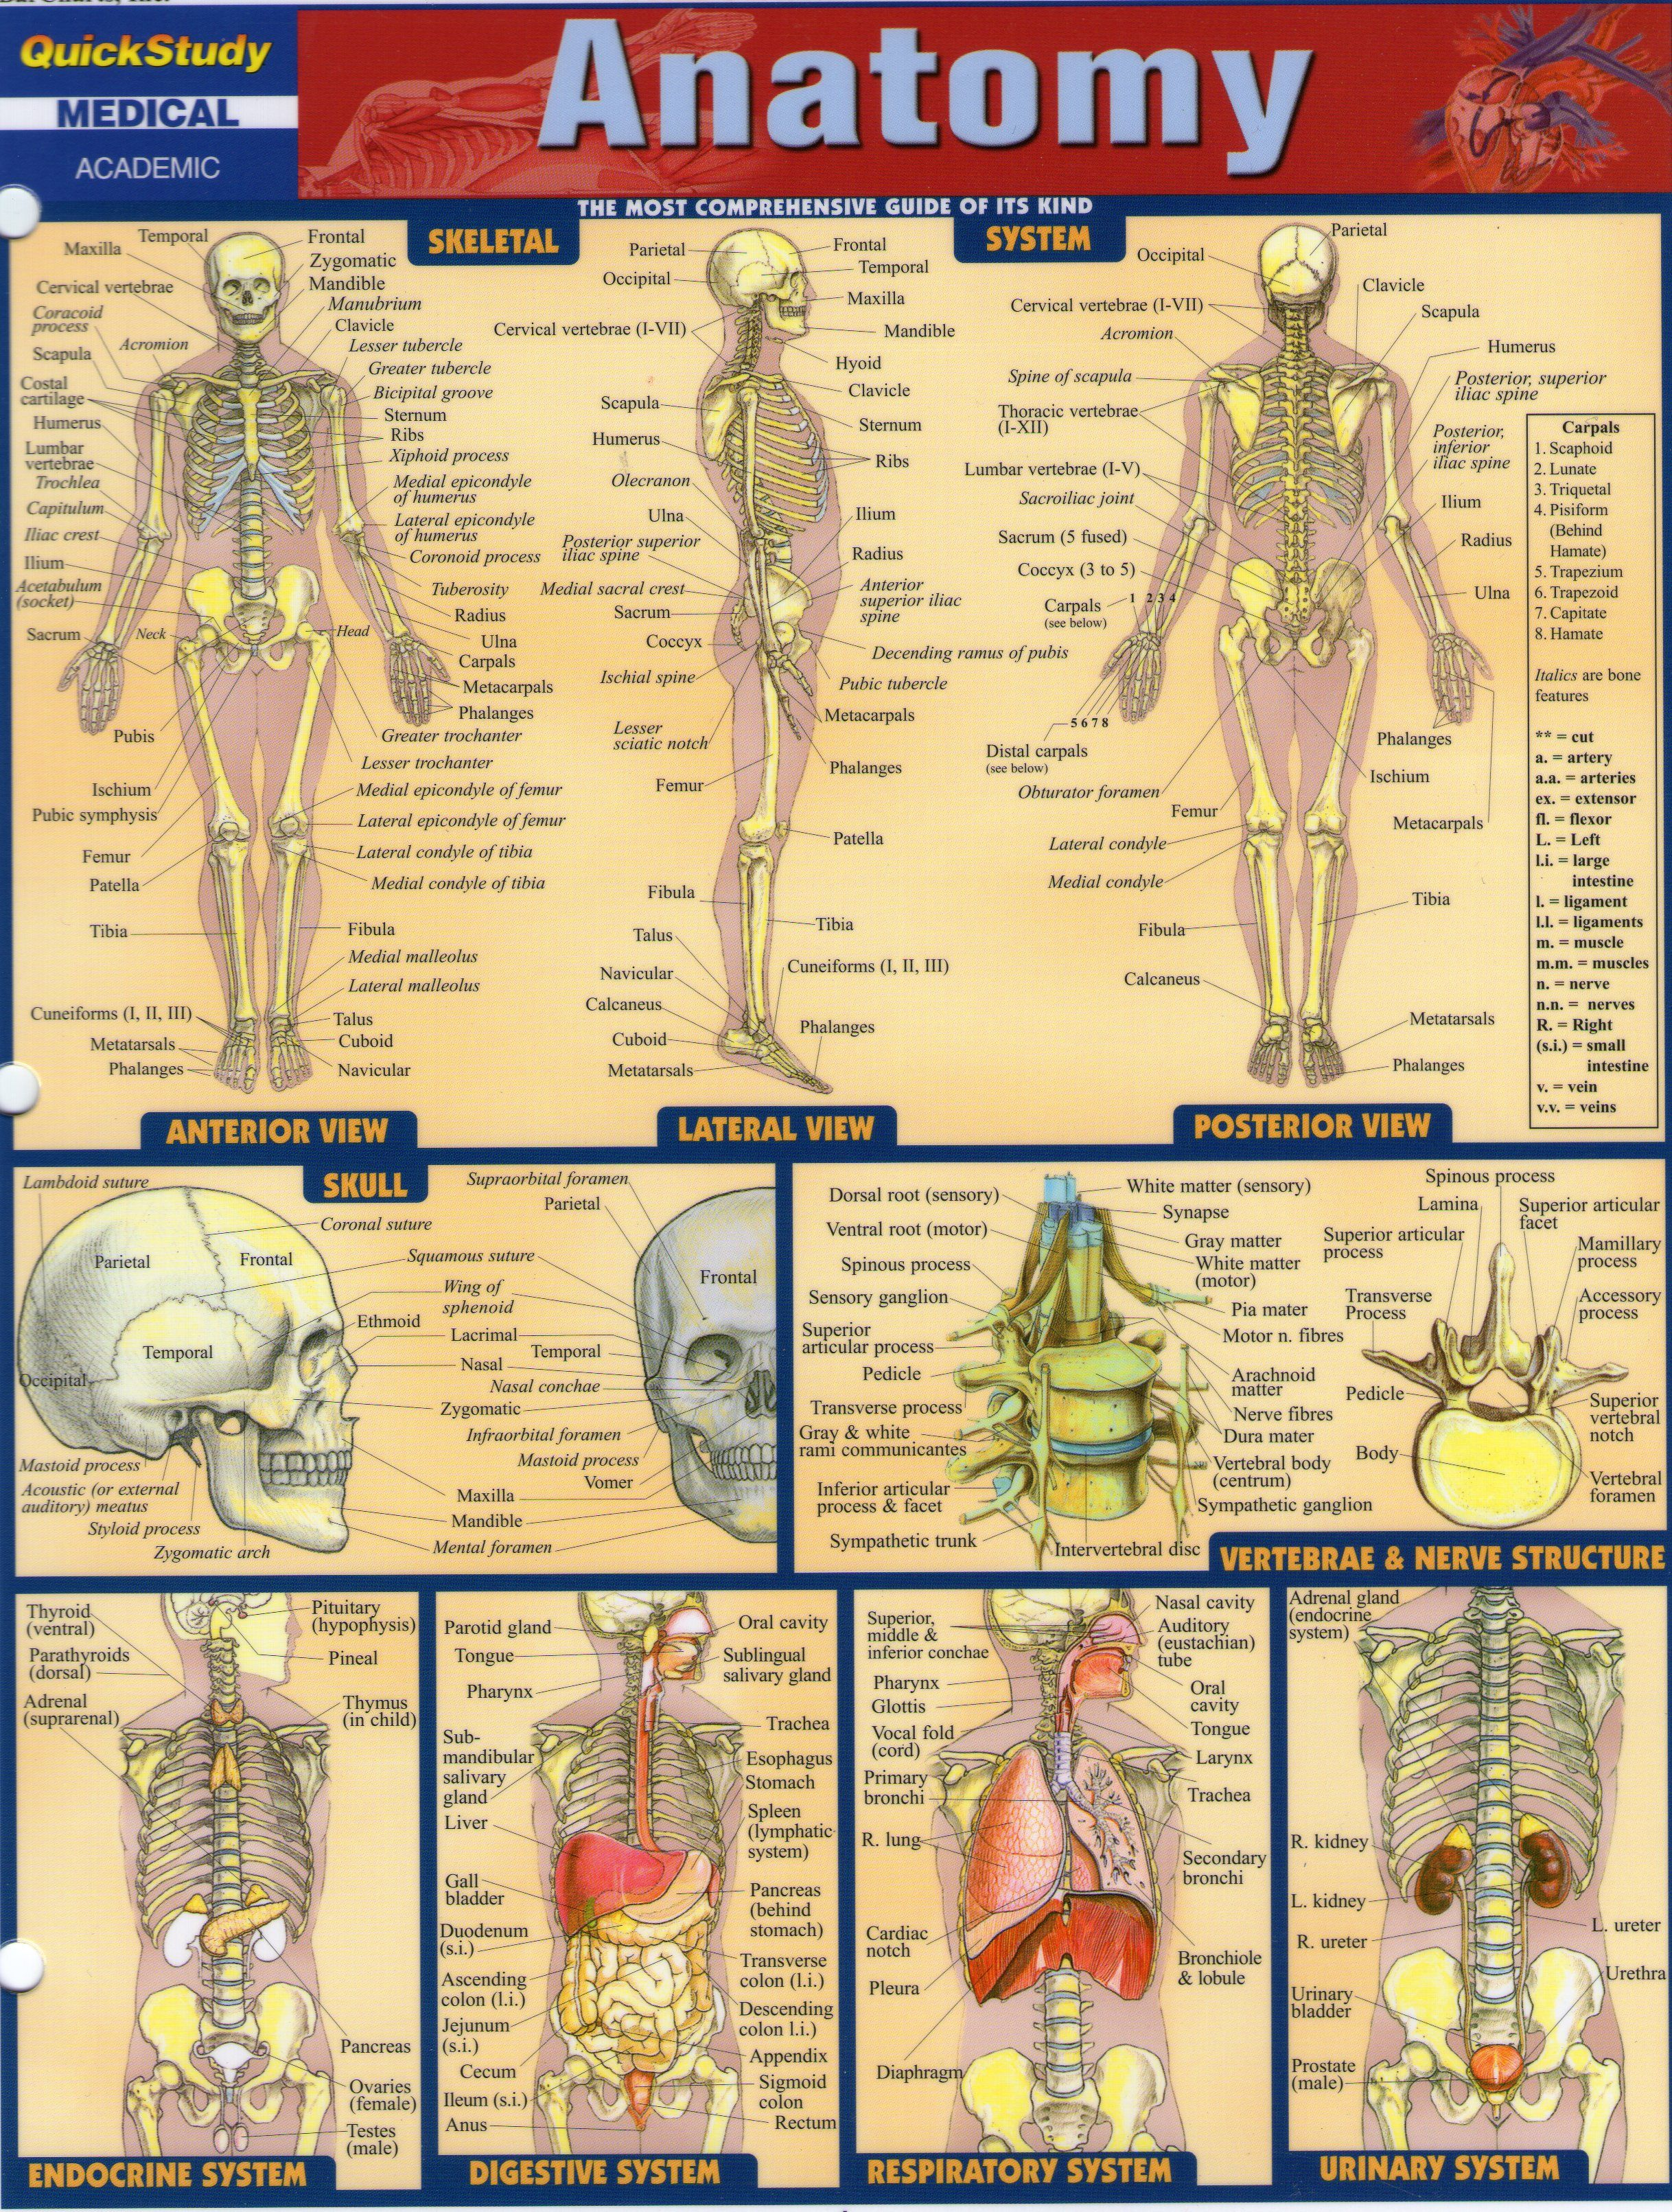 Anatomy 1 Nursing school prerequisites, Anatomy, Online